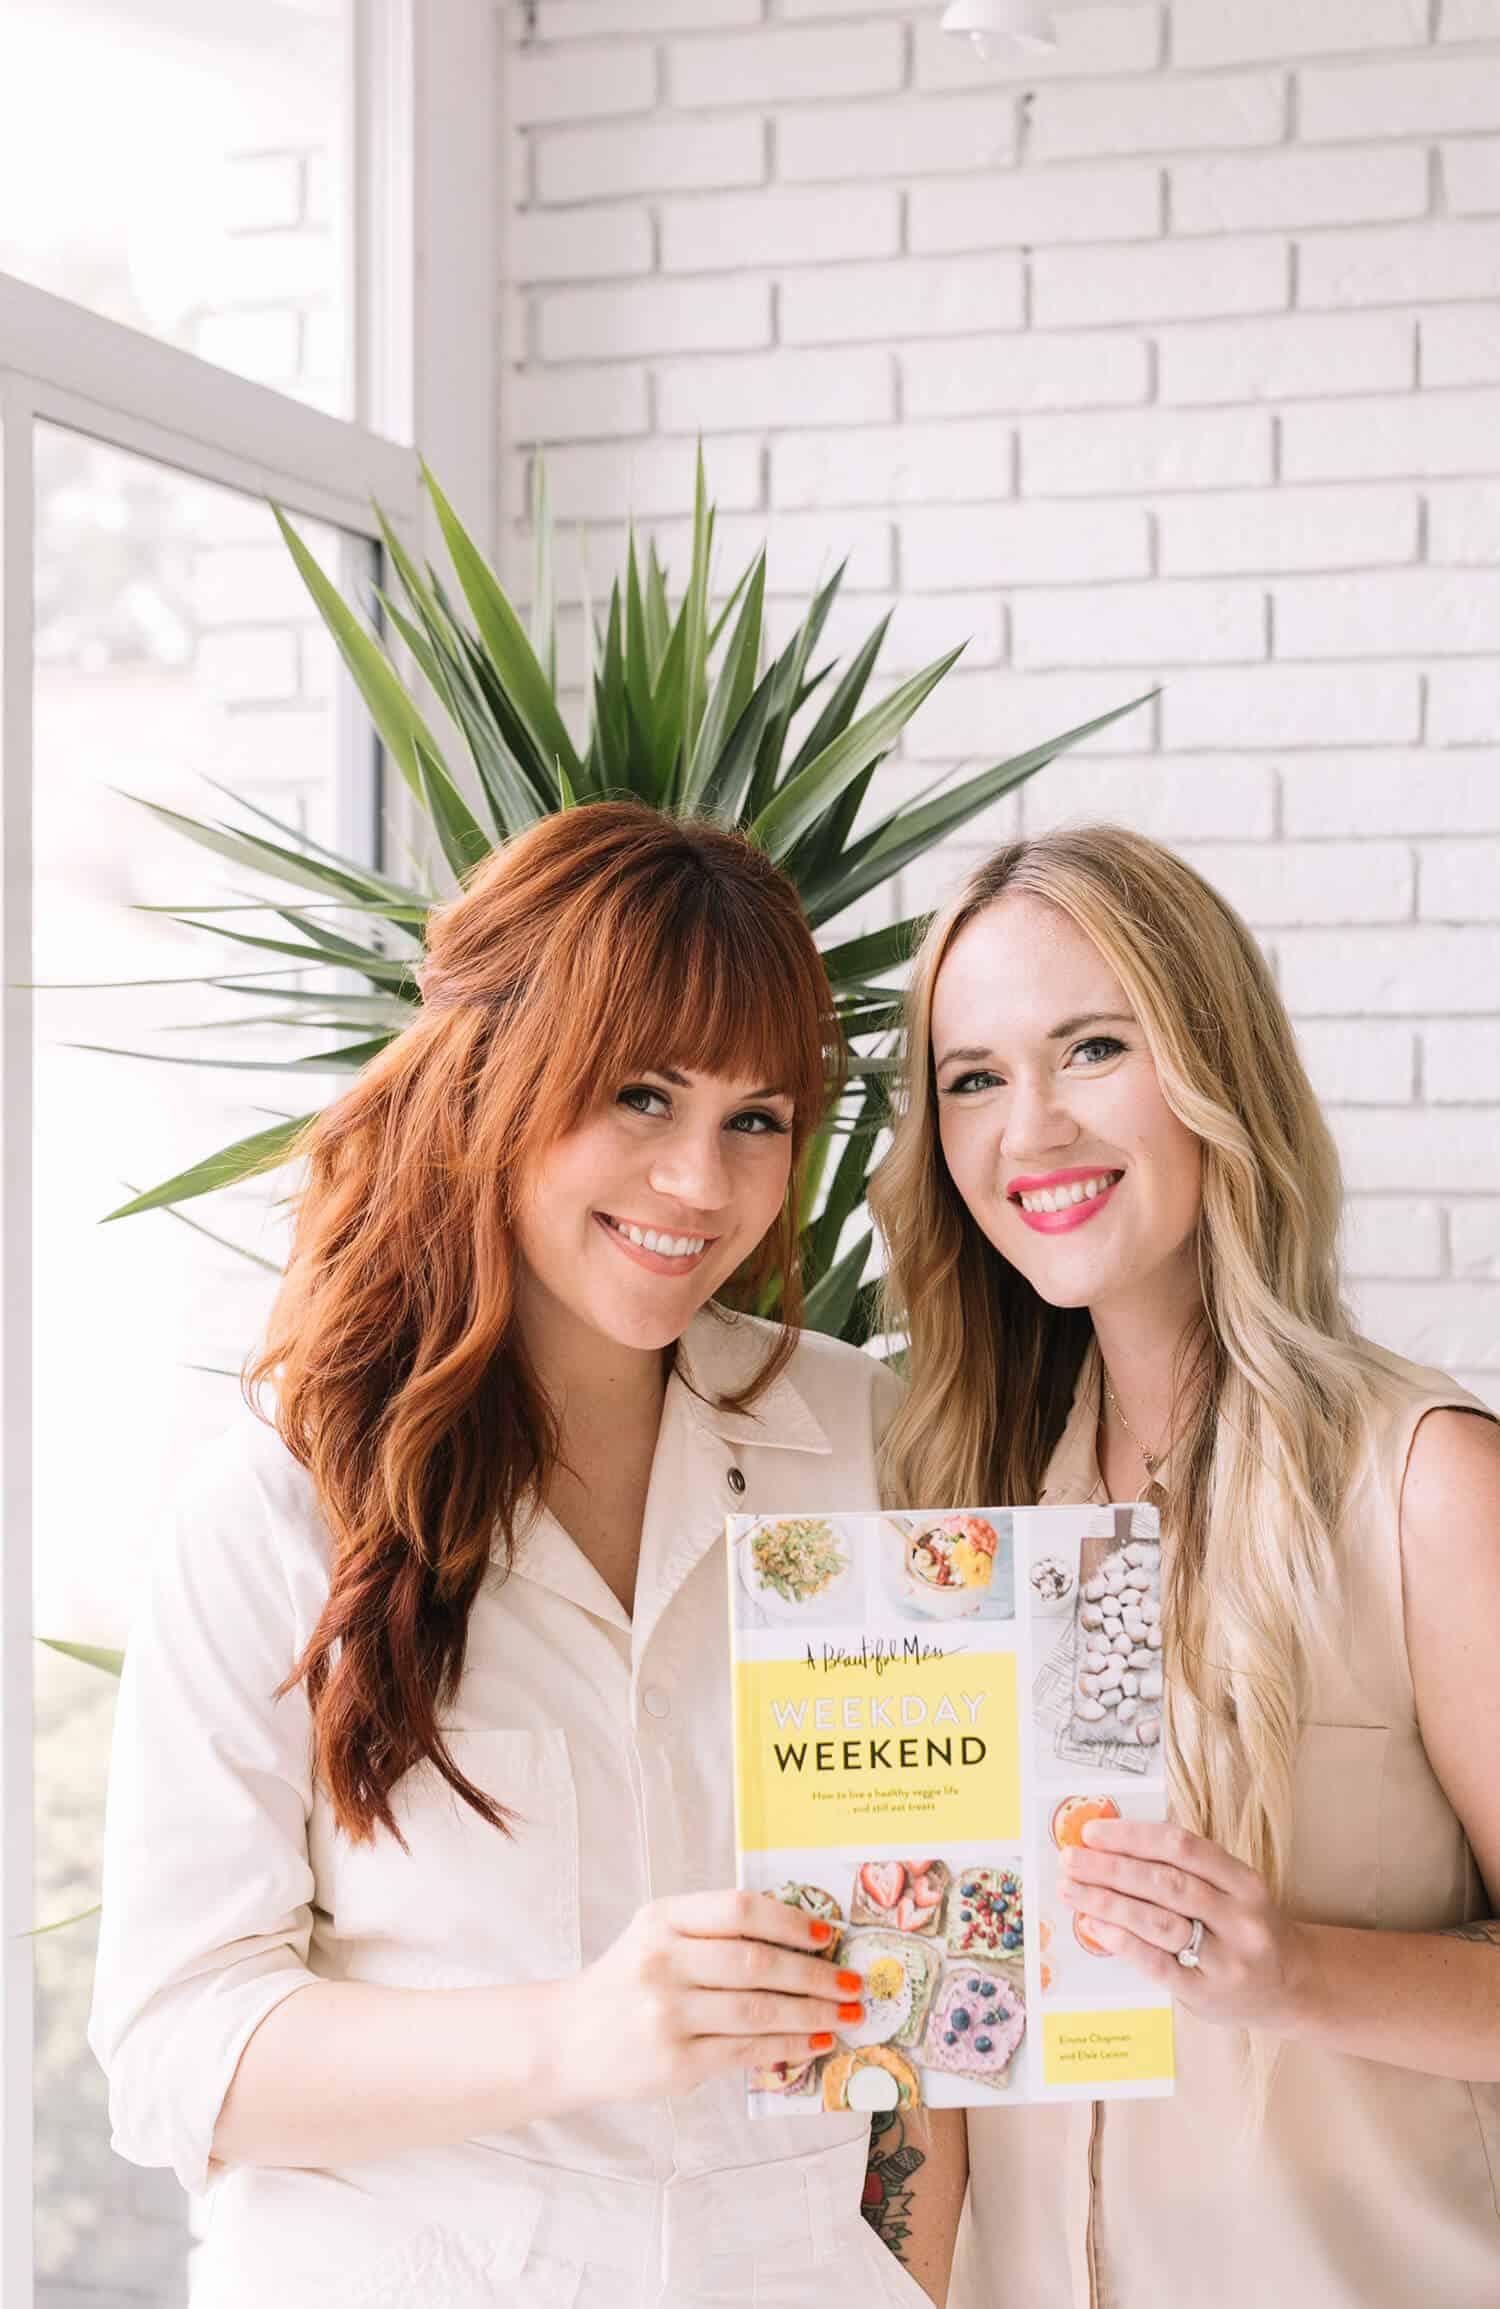 Weekday Weekend - Unser Kochbuch